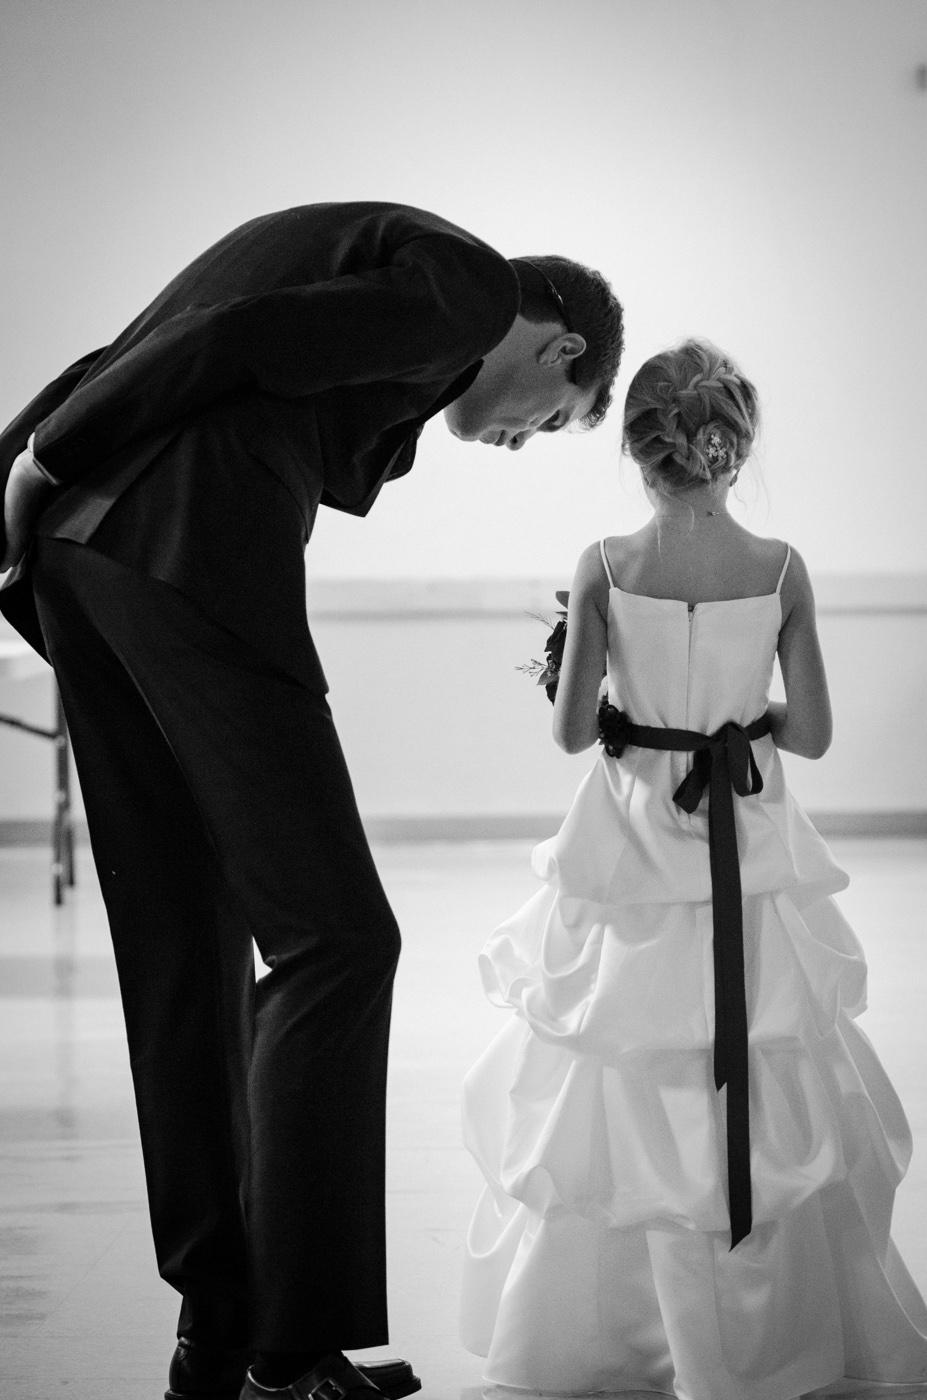 ss_weddingbest-7.jpg